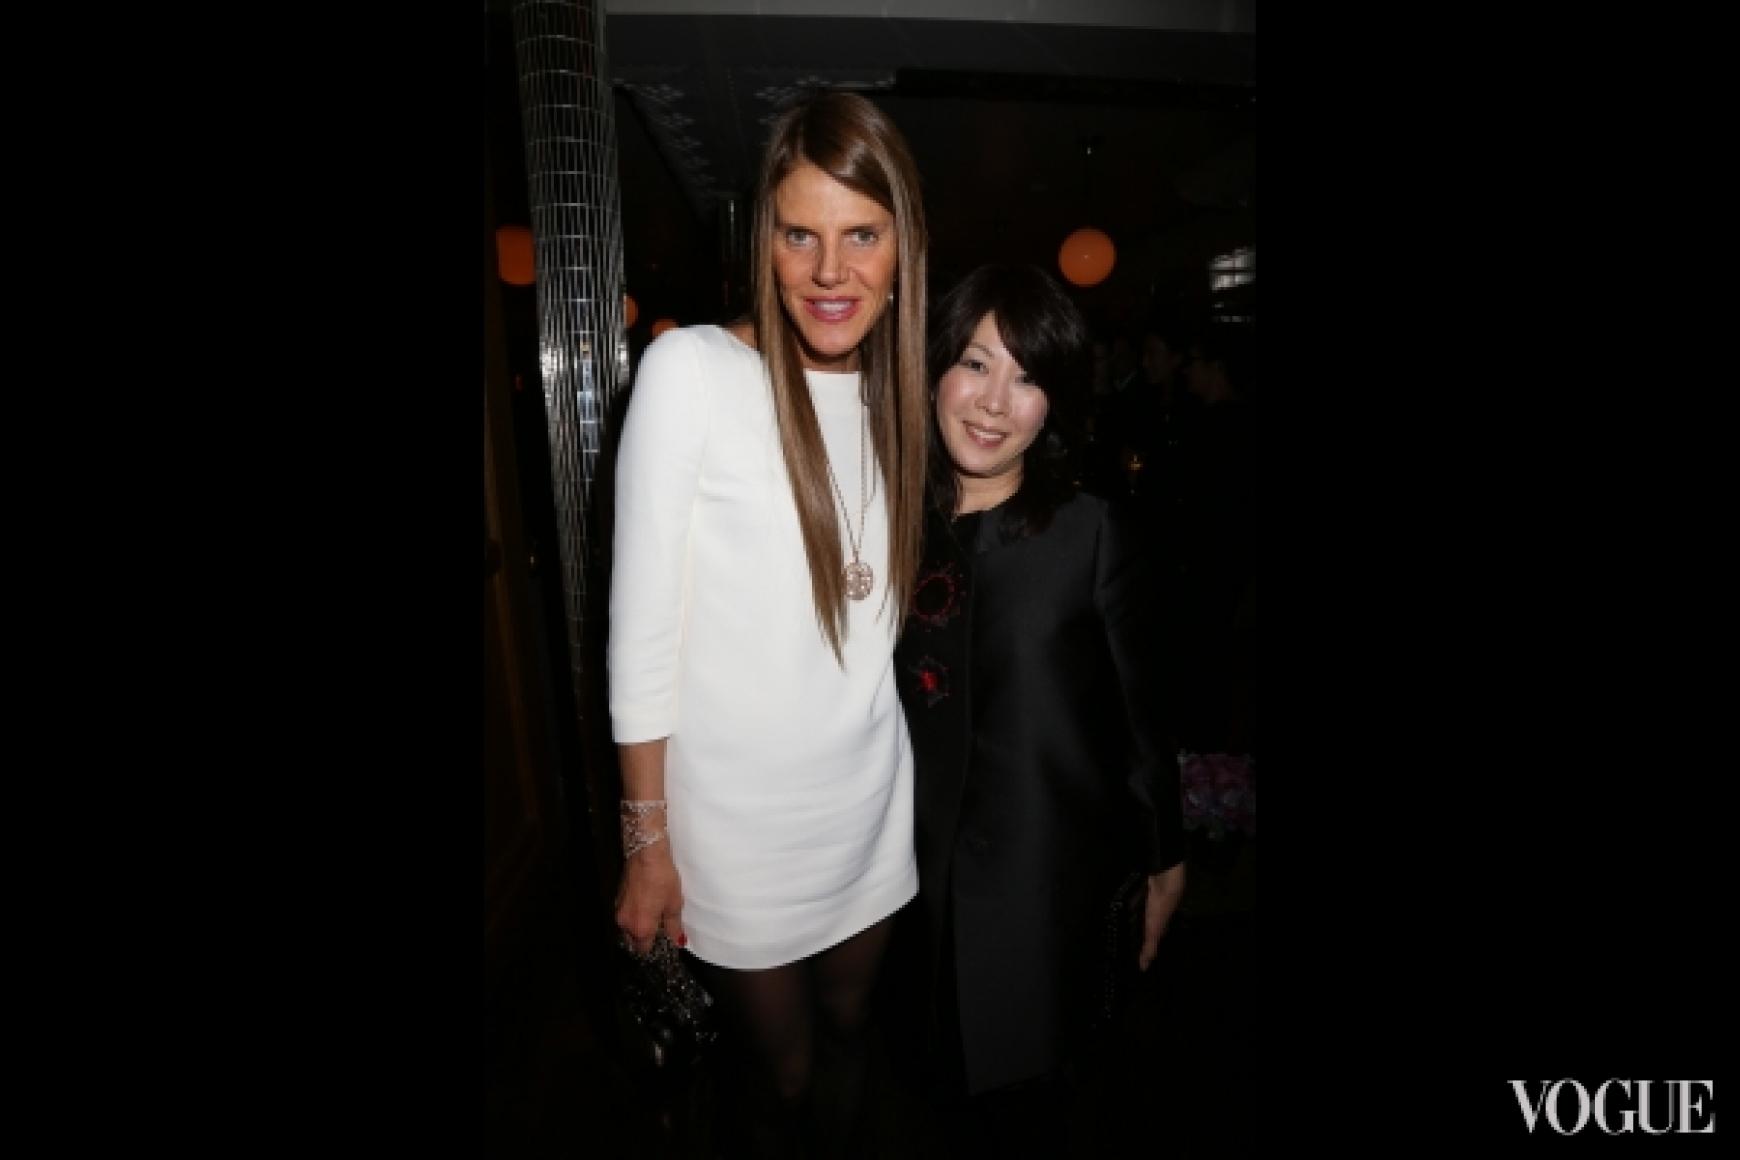 Анна Делло Руссо и Мицуко Ватанабе (Vogue Nippon)